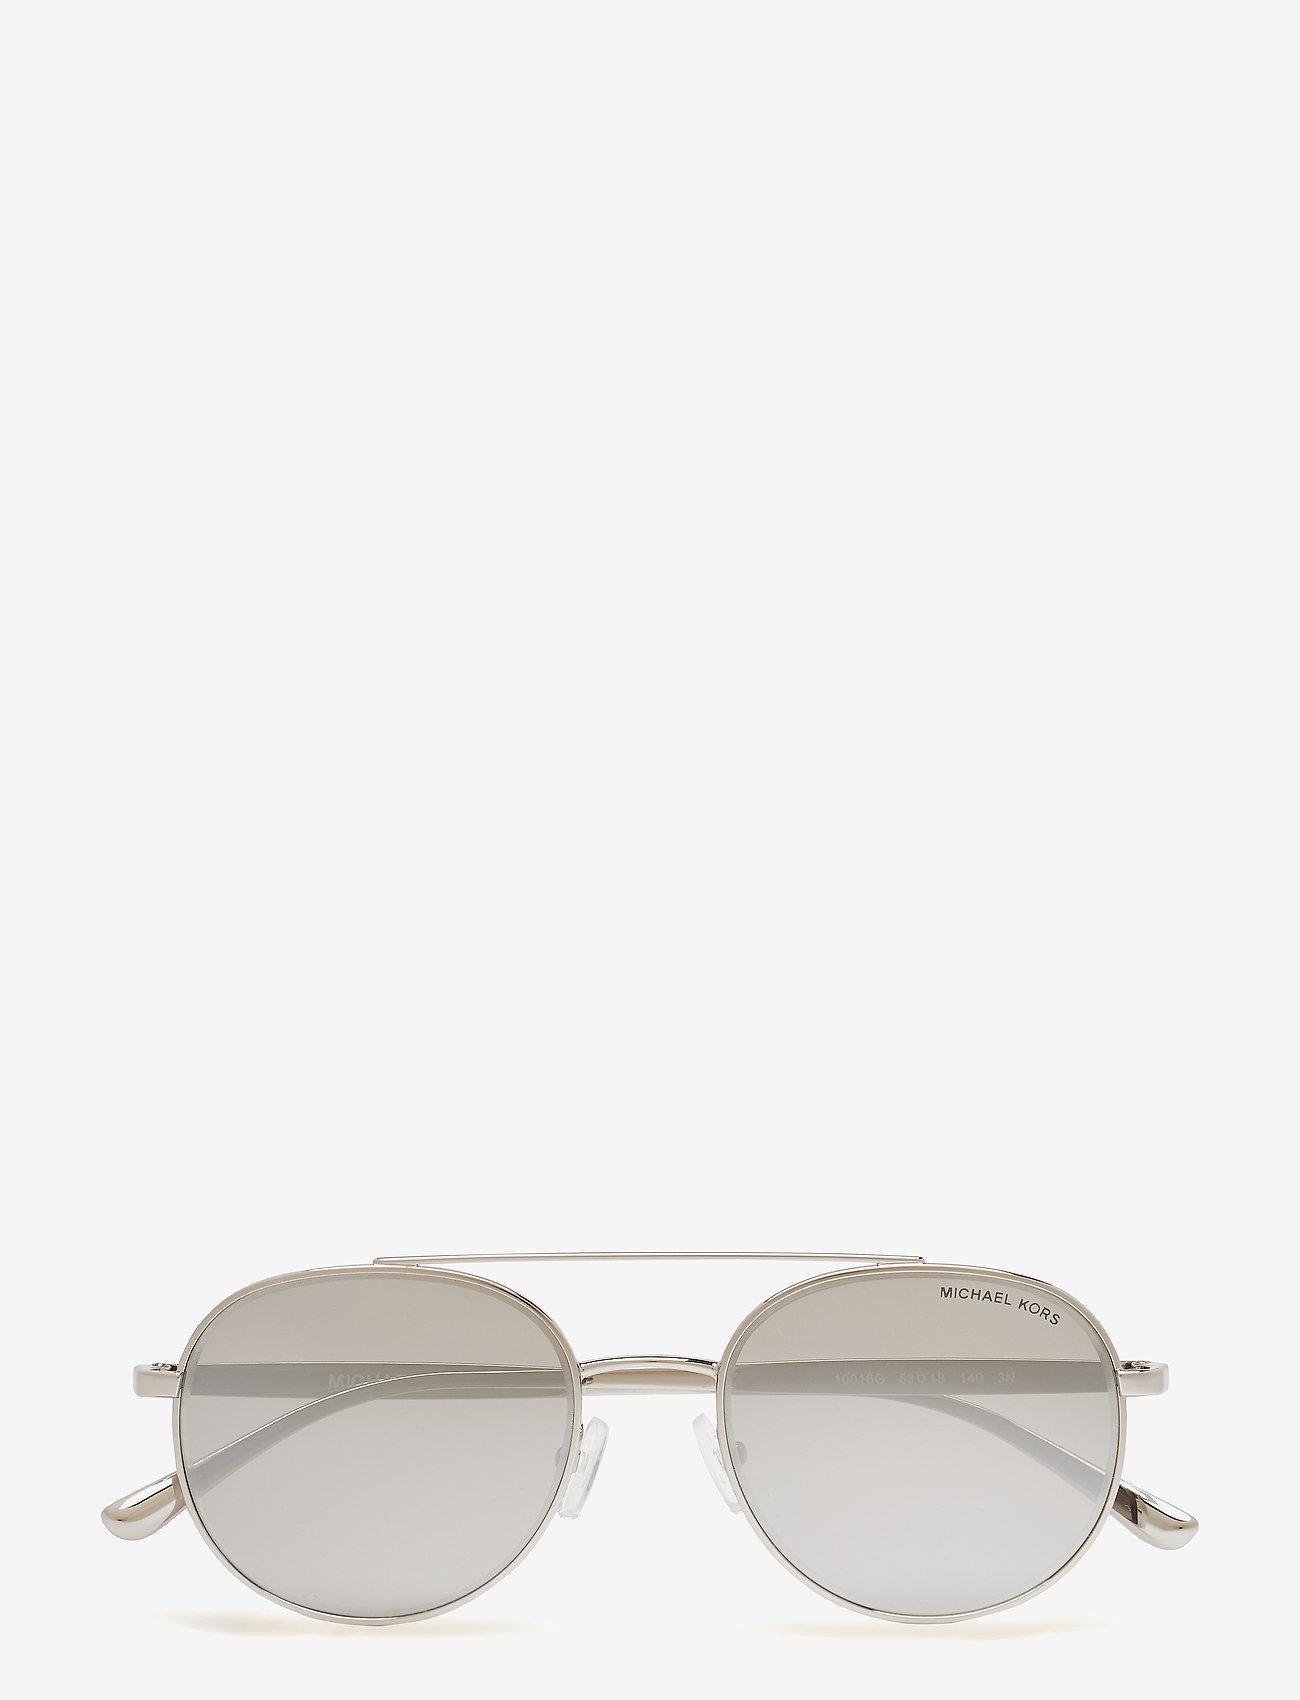 Michael Kors Sunglasses - Aviator - okulary przeciwsłoneczne aviator - silver - 0